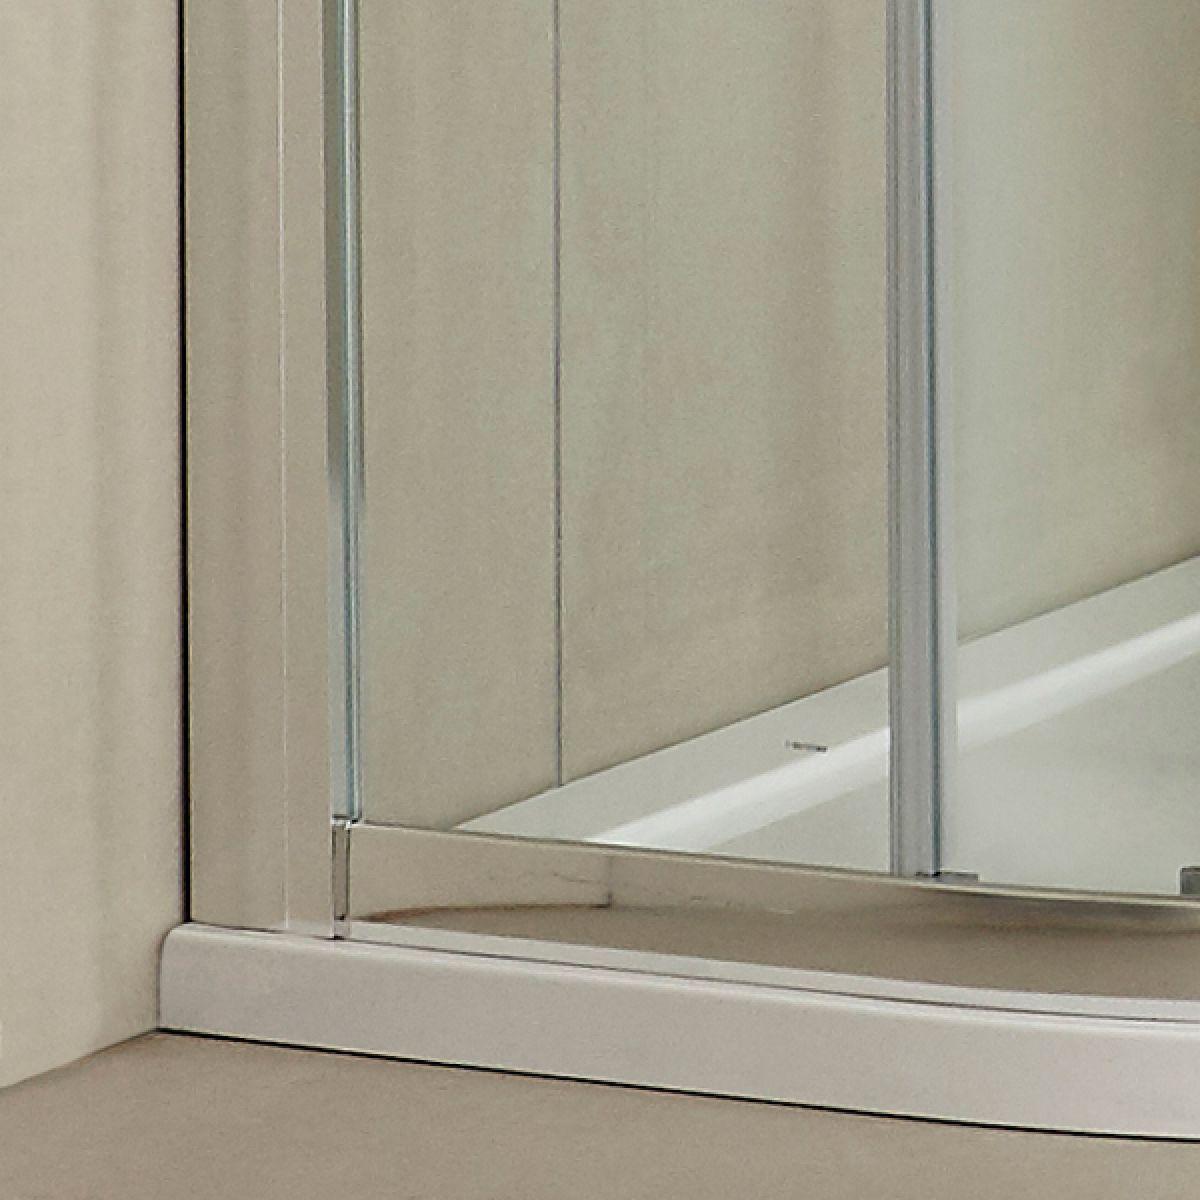 Hudson Reed Apex Quadrant Double Door Shower Enclosure - Frame